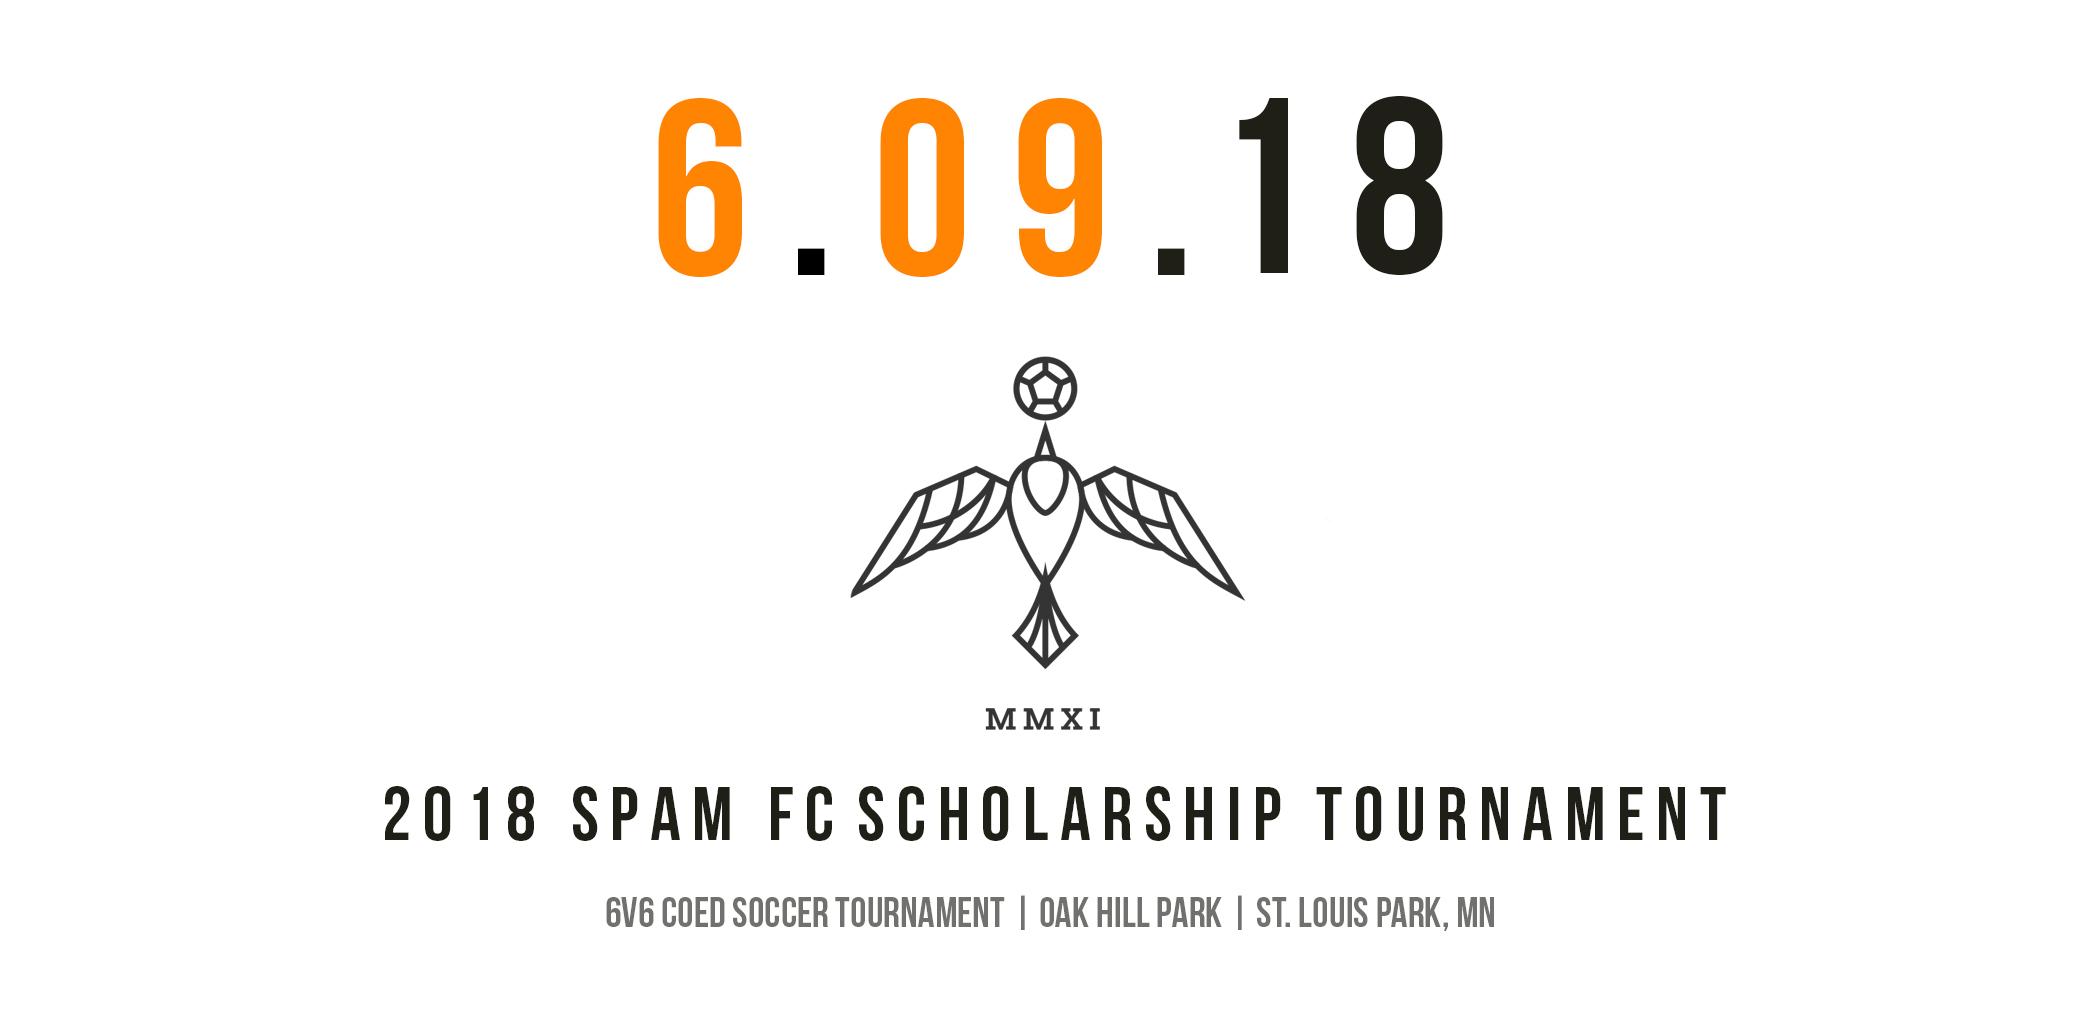 2018 SPAM FC Scholarship tournament.jpg